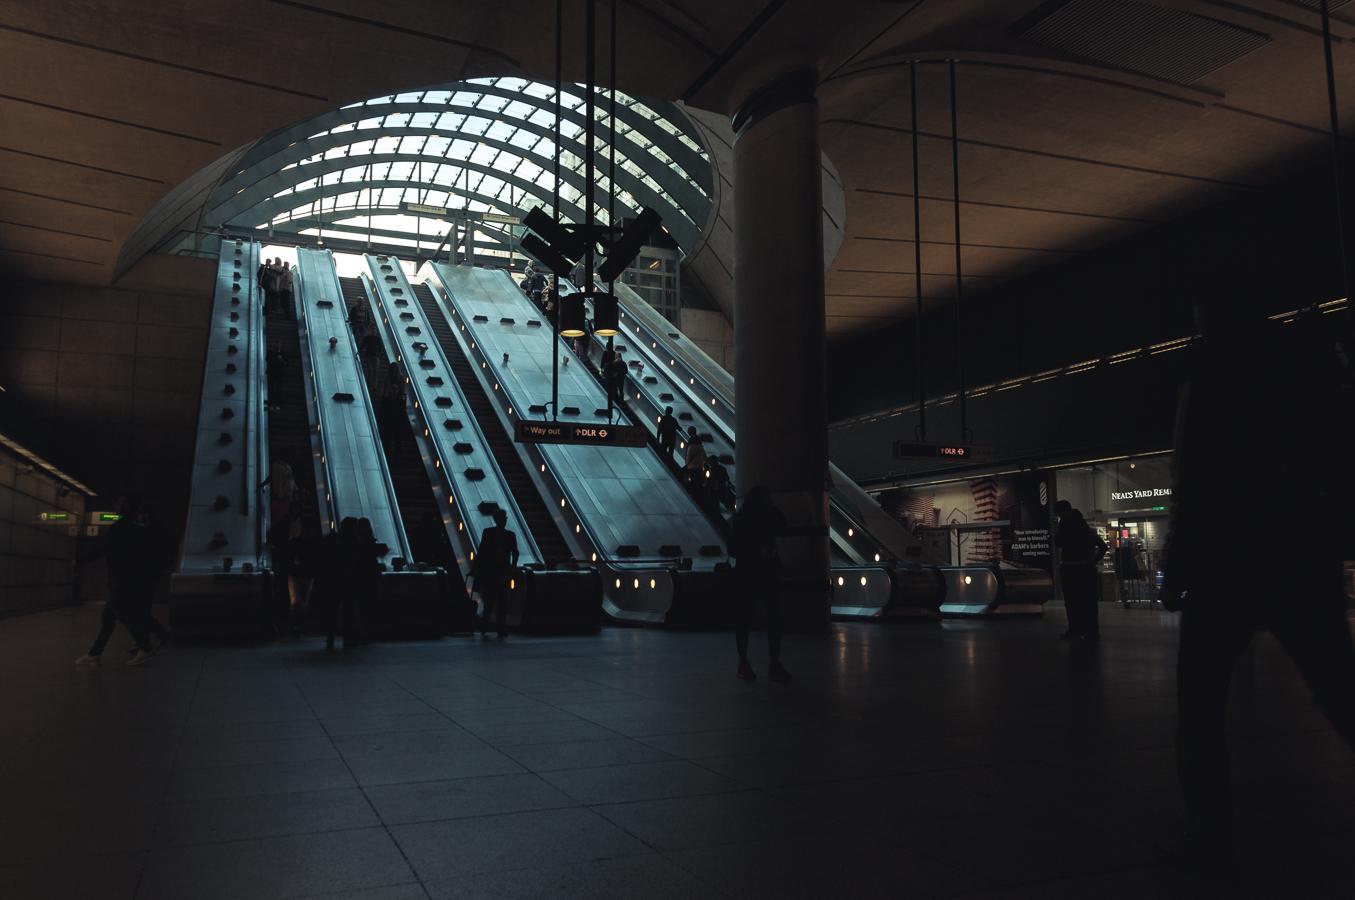 canary-warf-tube-station.jpg